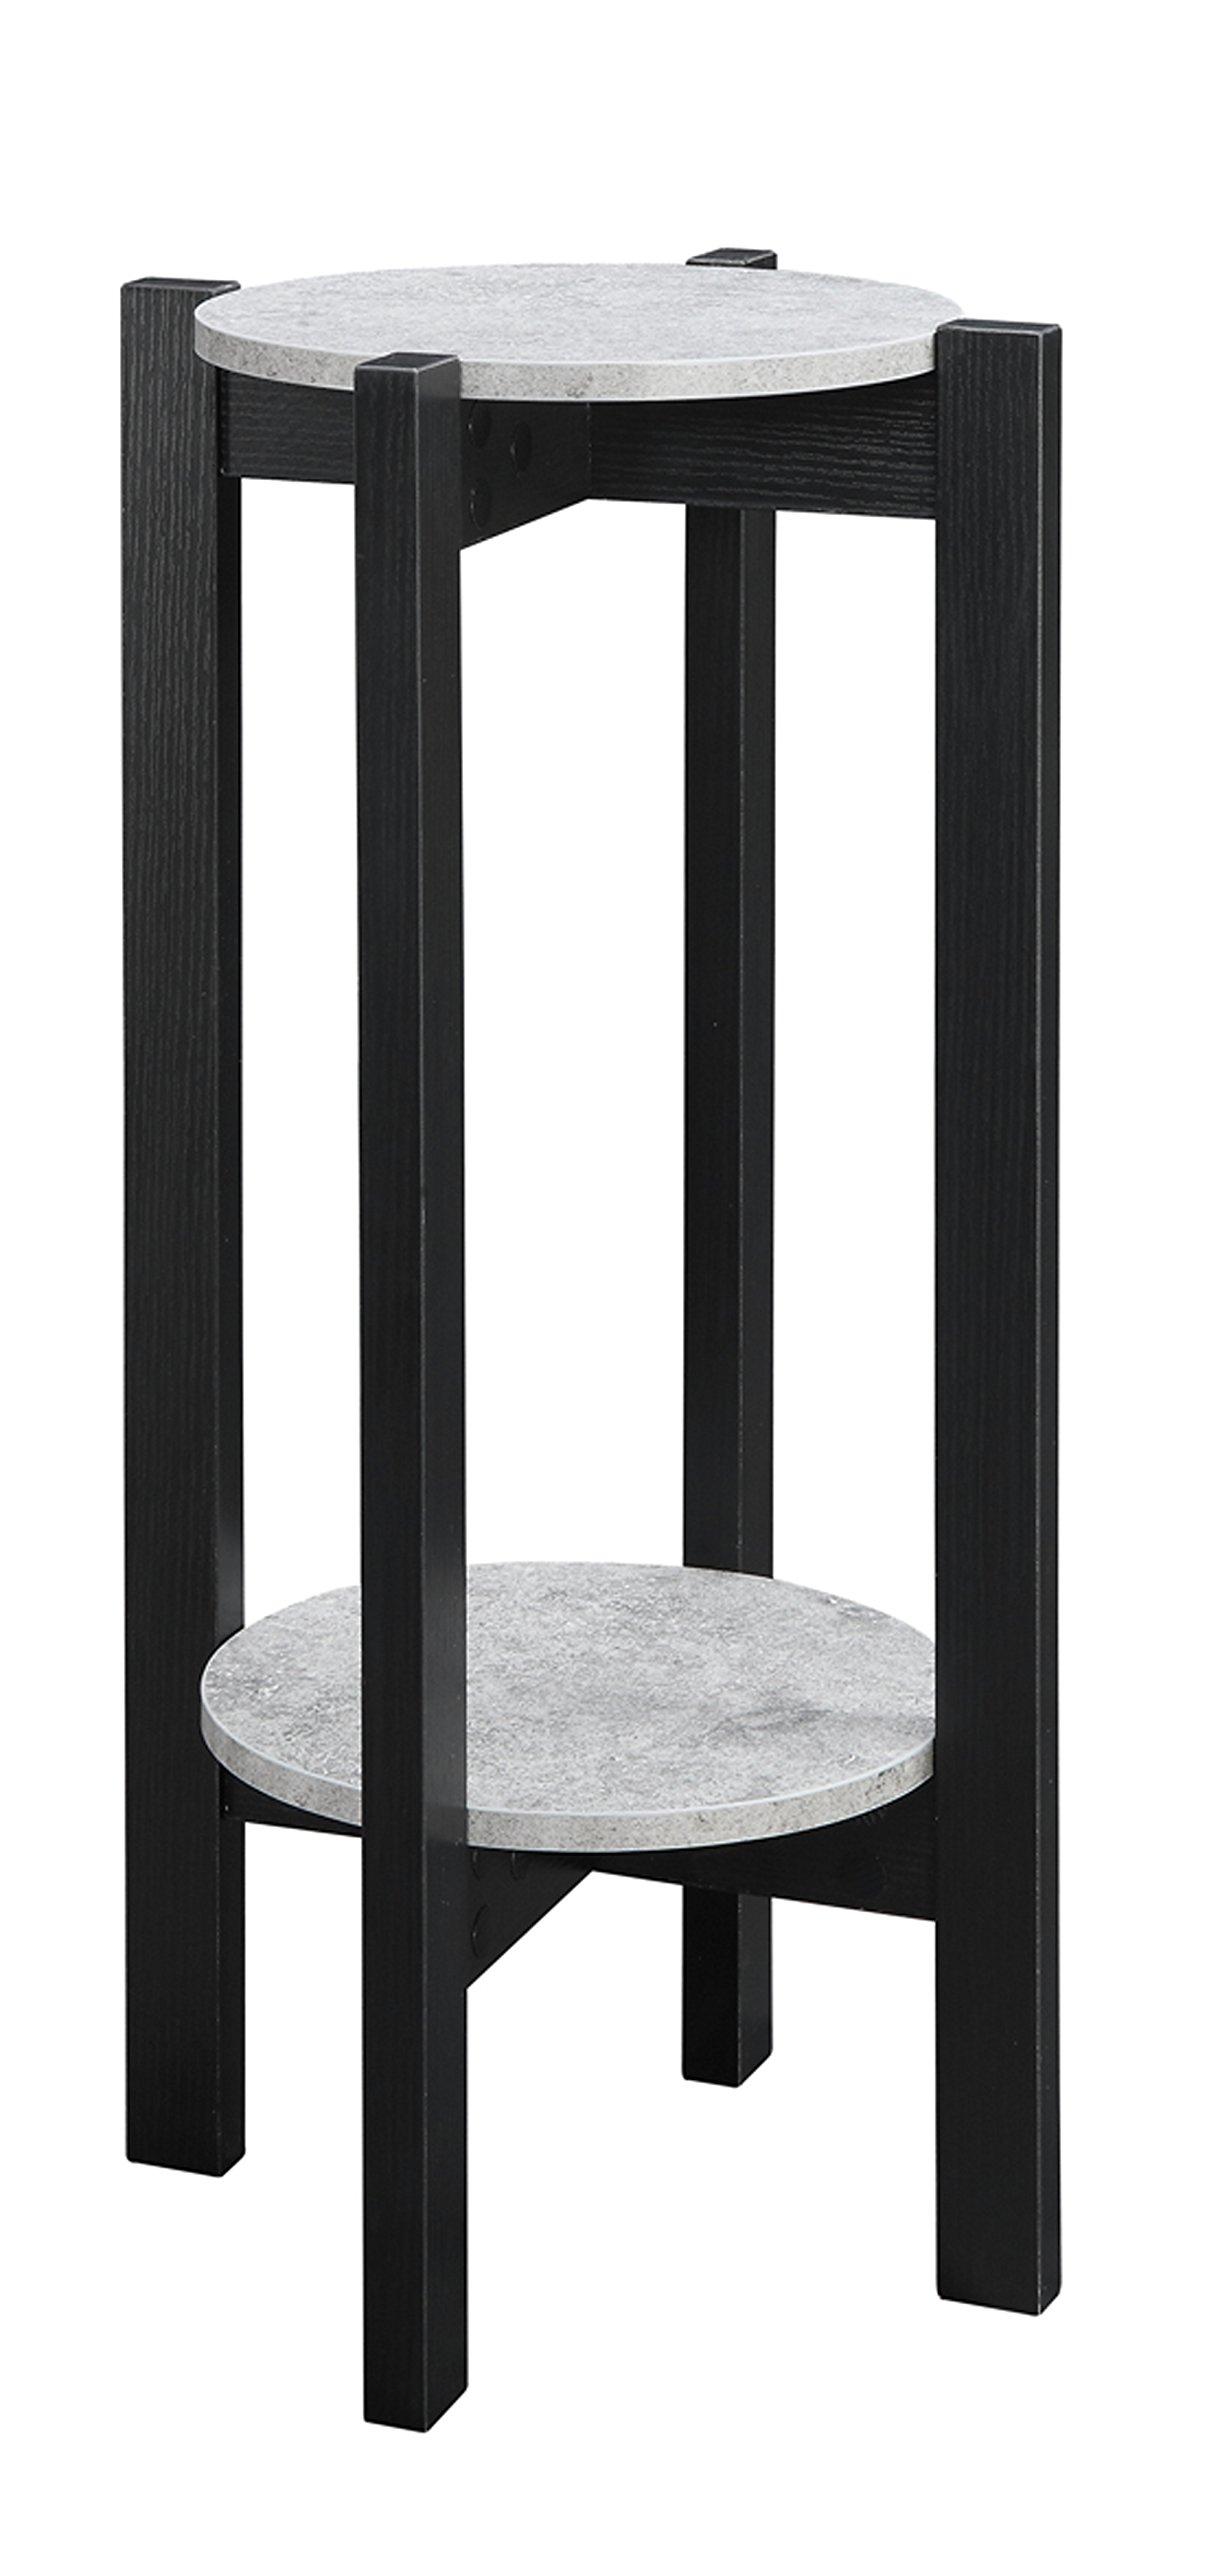 Convenience Concepts Newport Deluxe Plant Stand, Faux Cement / Black